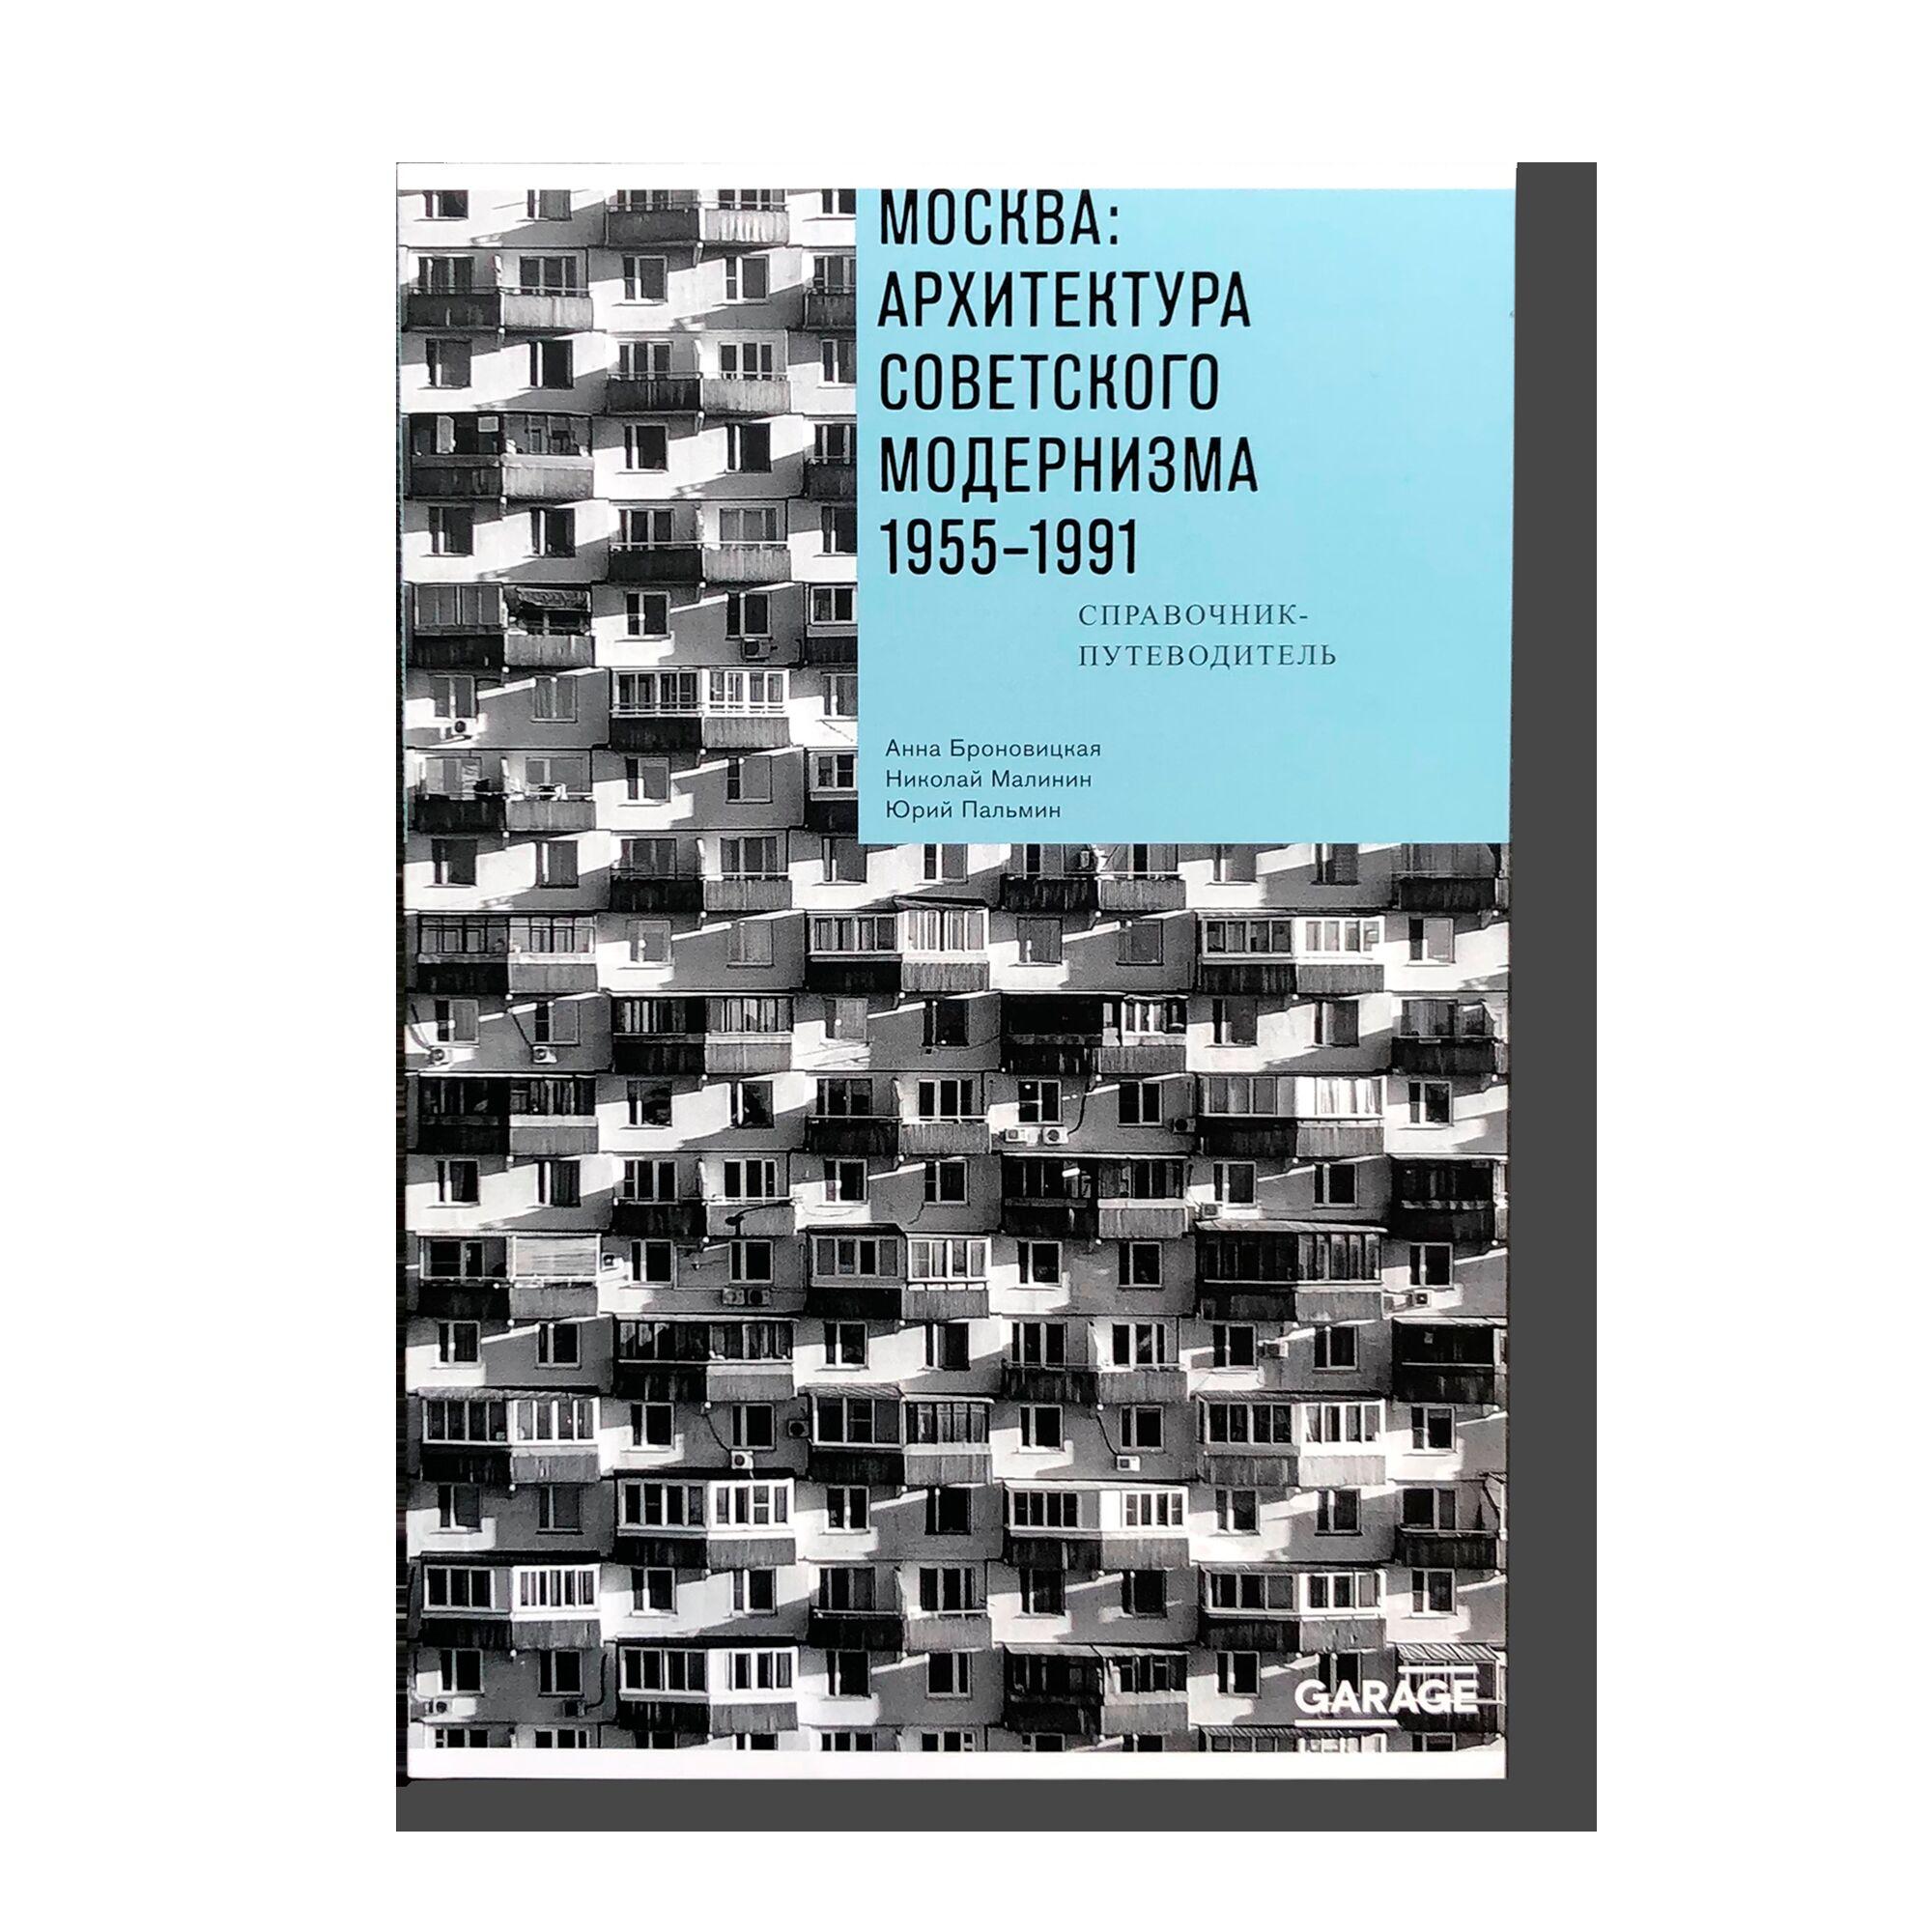 Москва: архитектура советского модернизма 1955-1991